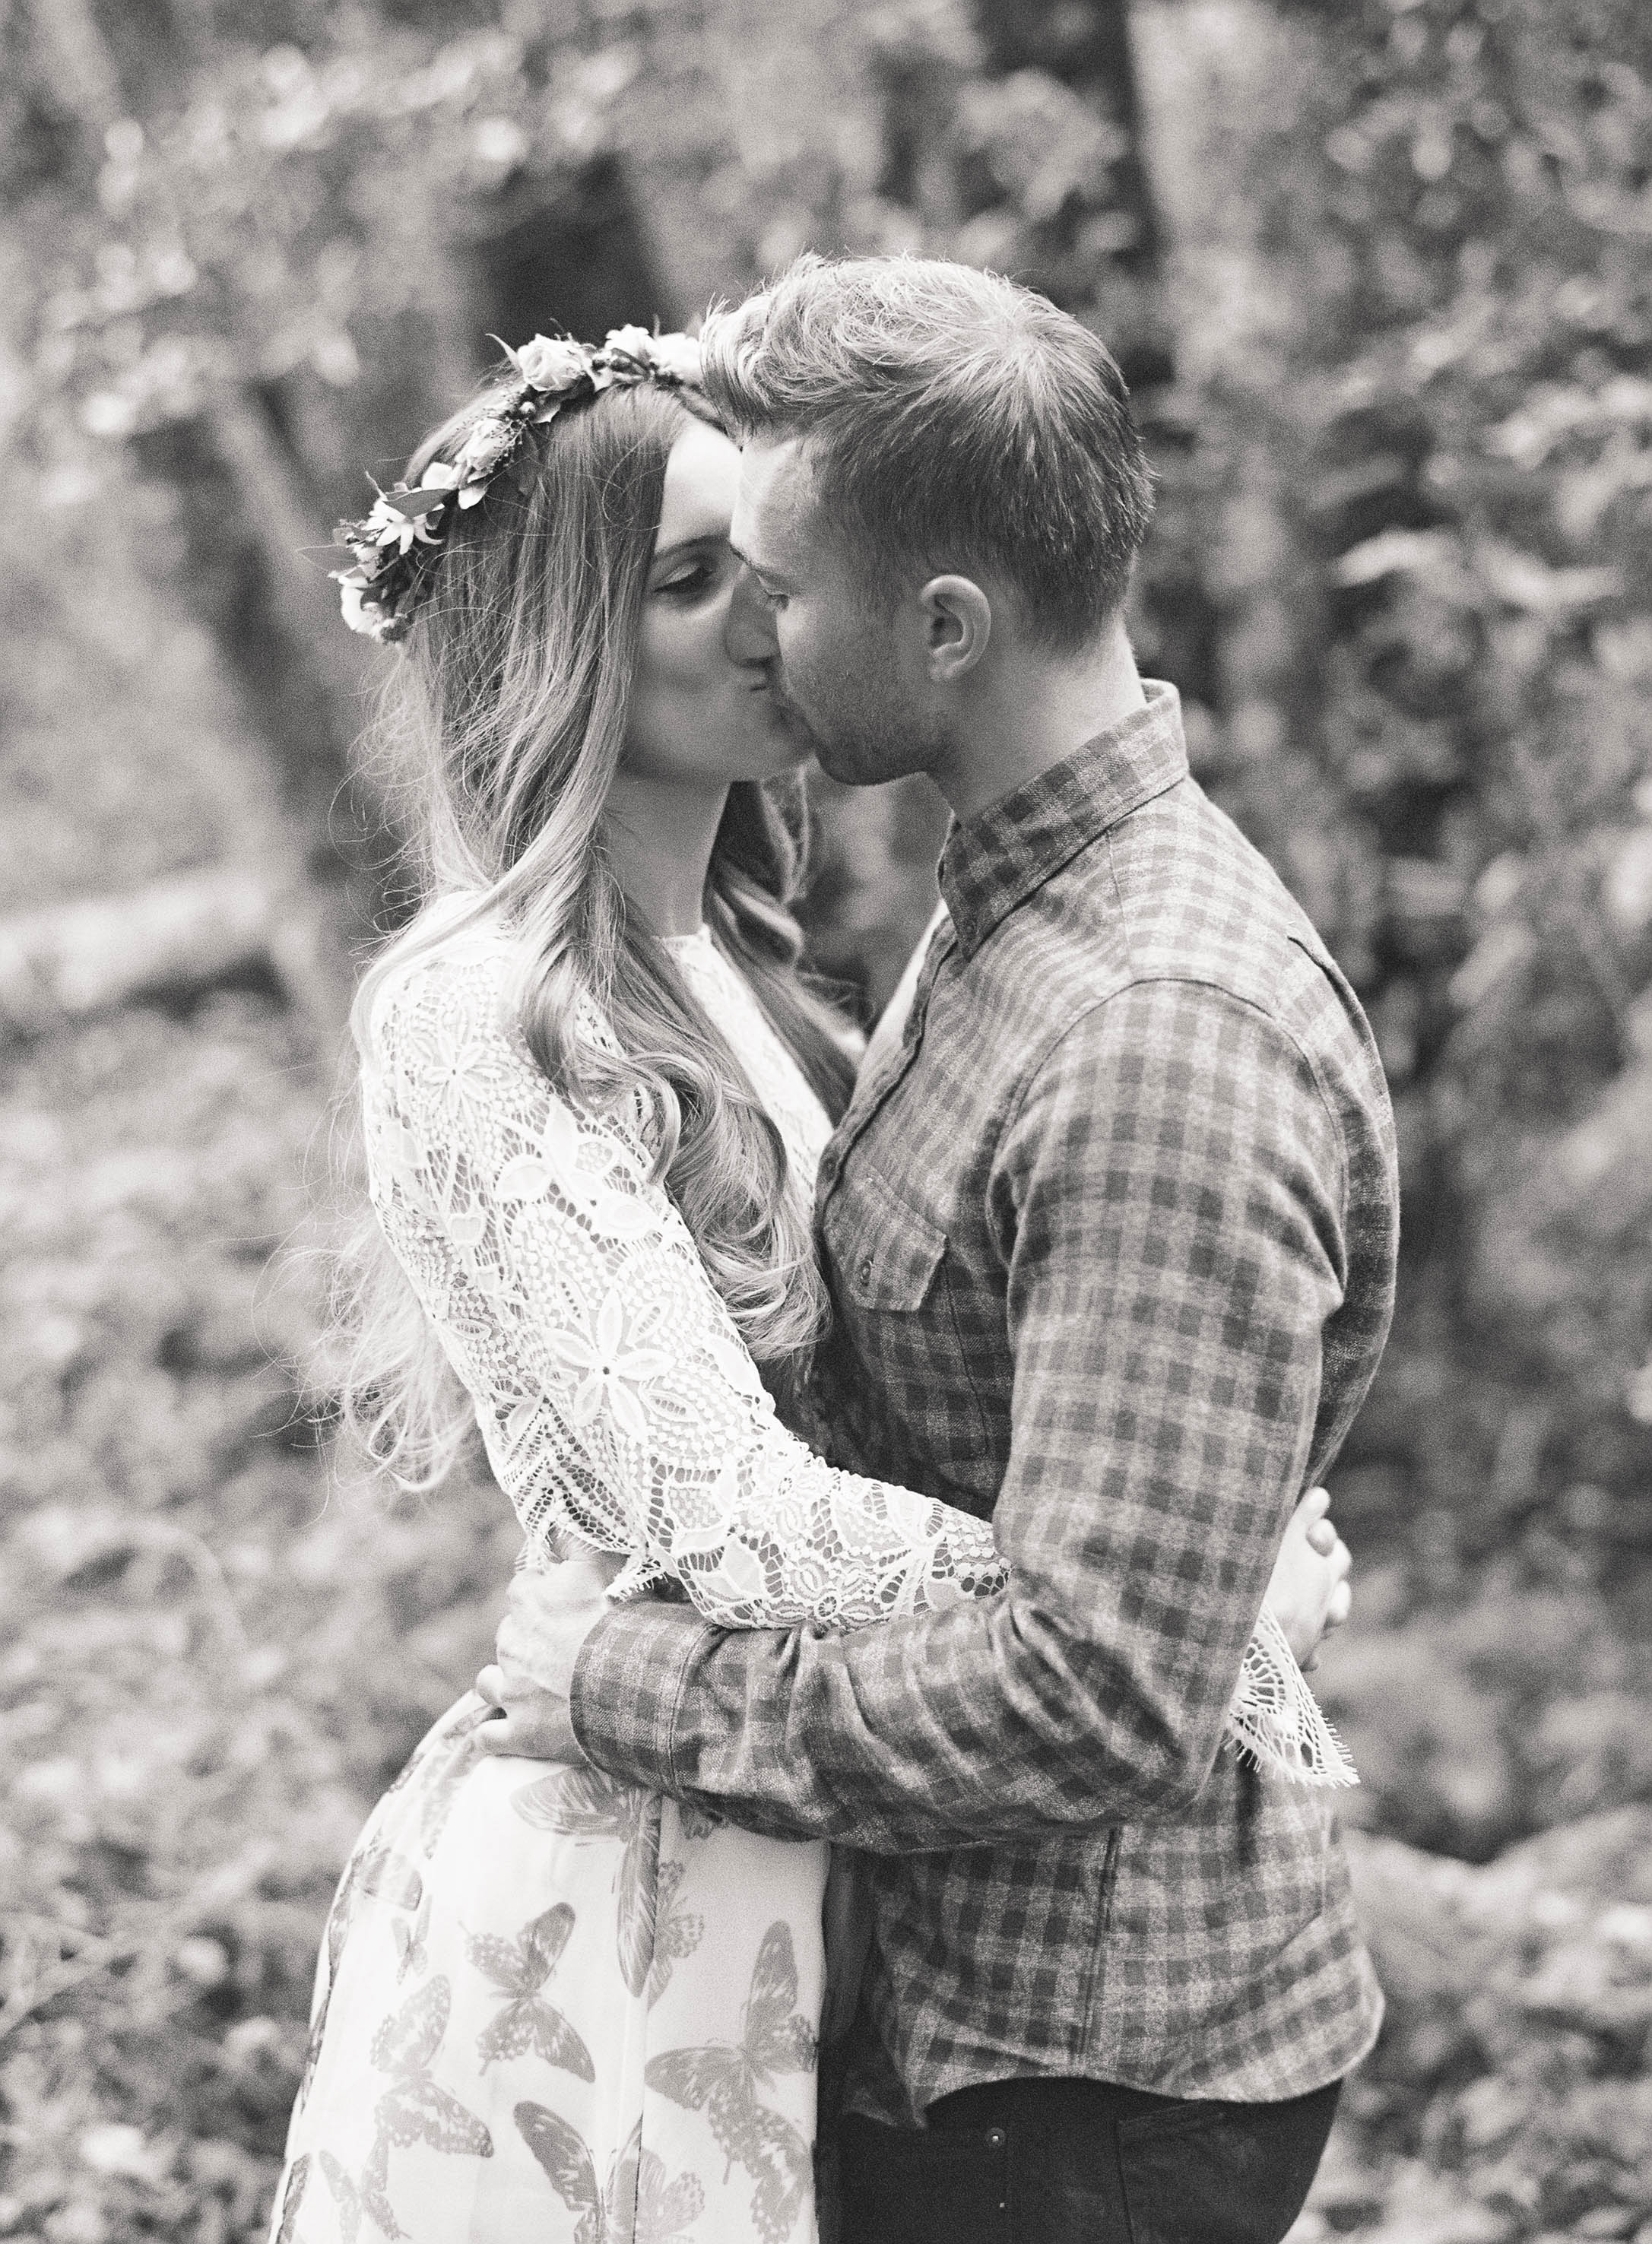 Meghan Mehan Photography - Fine Art Film Wedding Photography - San Francisco | Napa | Sonoma | Big Sur | Chicago | Minneapolis | Milwaukee | Lake Geneva | Door County | Wisconsin 041.jpg